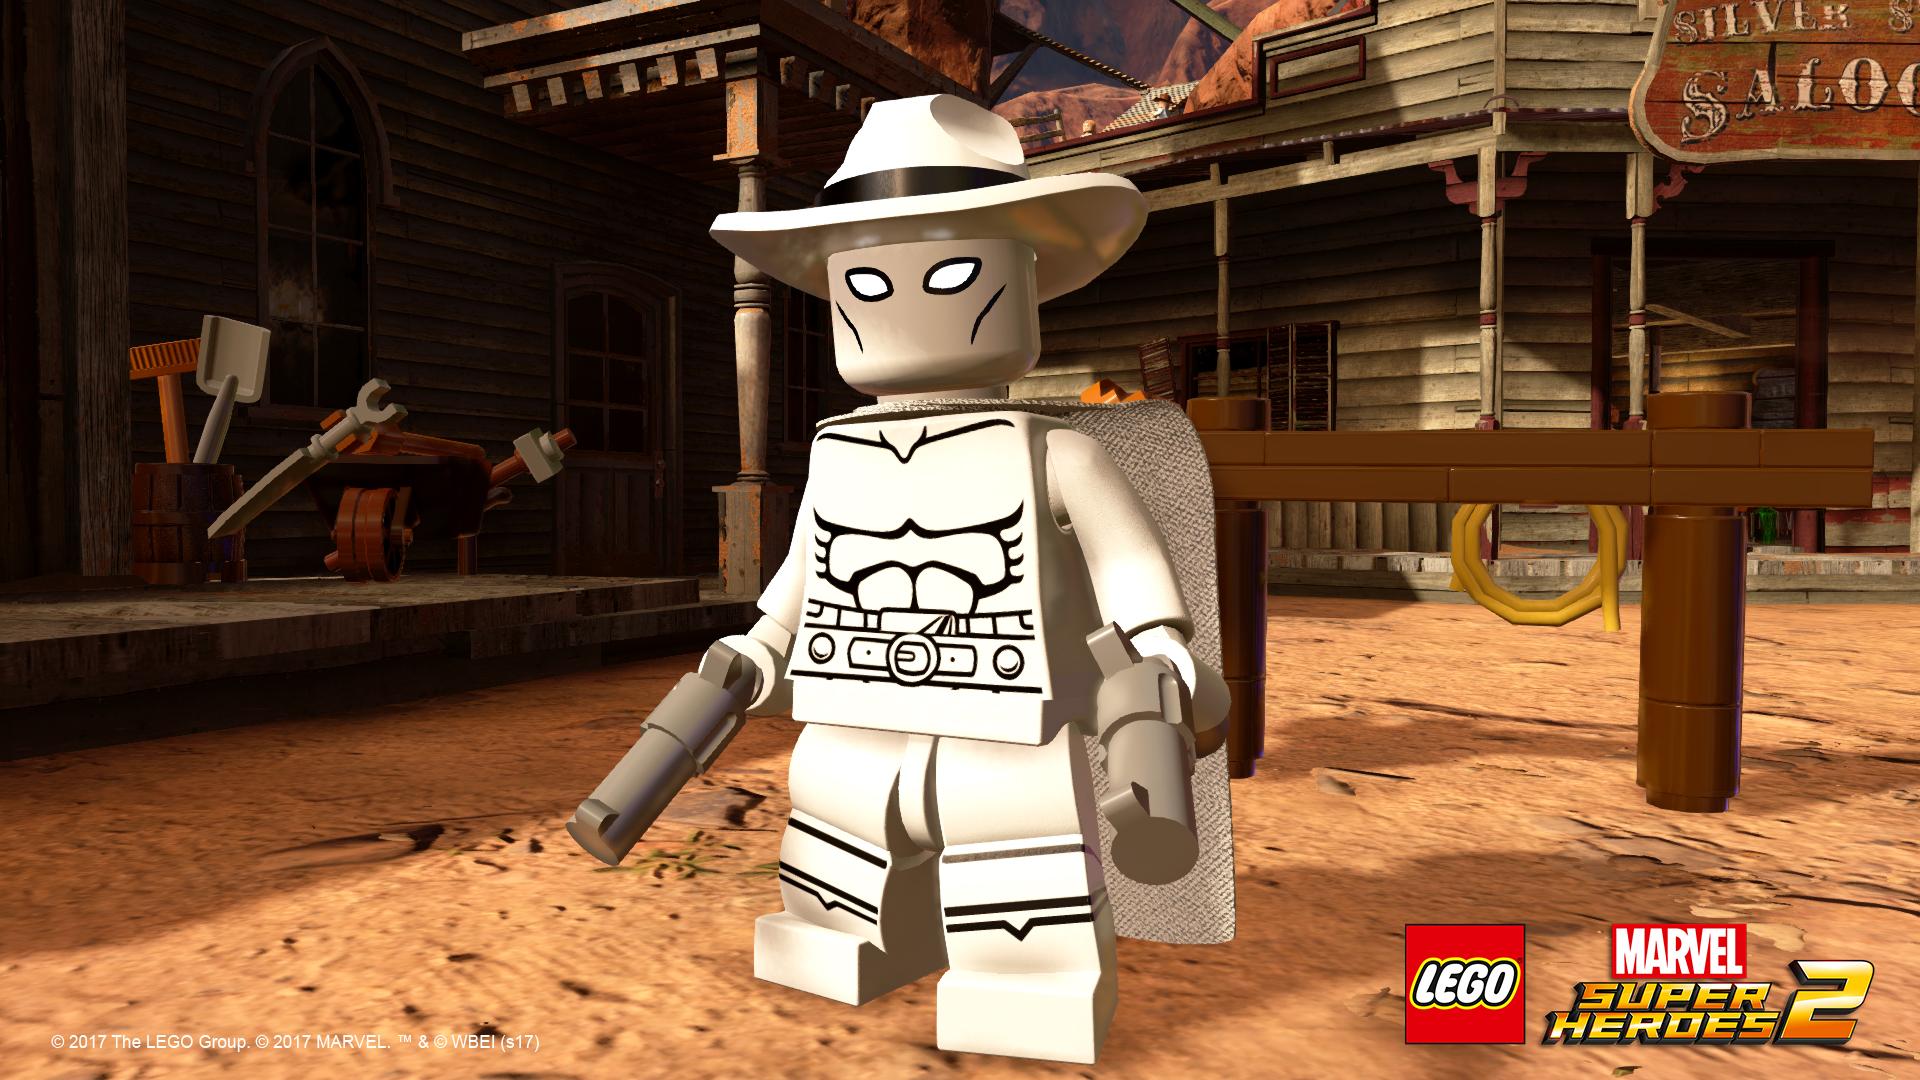 LEGO_Marvel_Super_Heroes_2_-_Phantom_Rider_1507794998